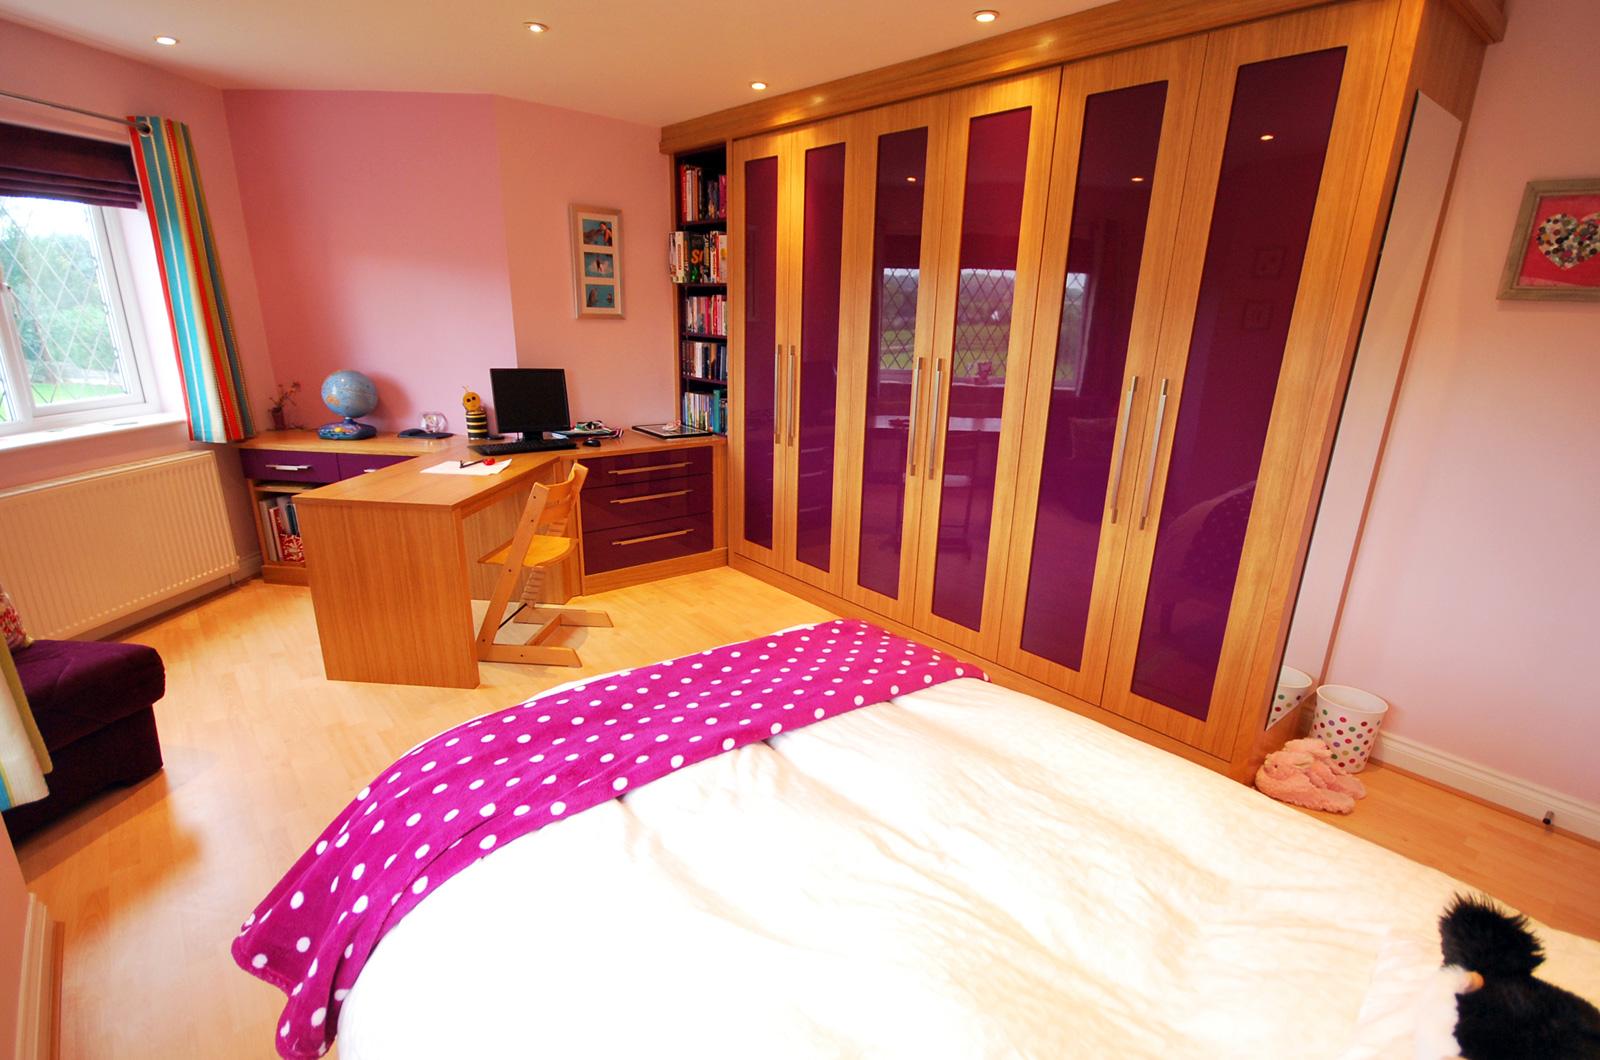 Bespoke kids bedroom furniture in purple high gloss and cherry wood